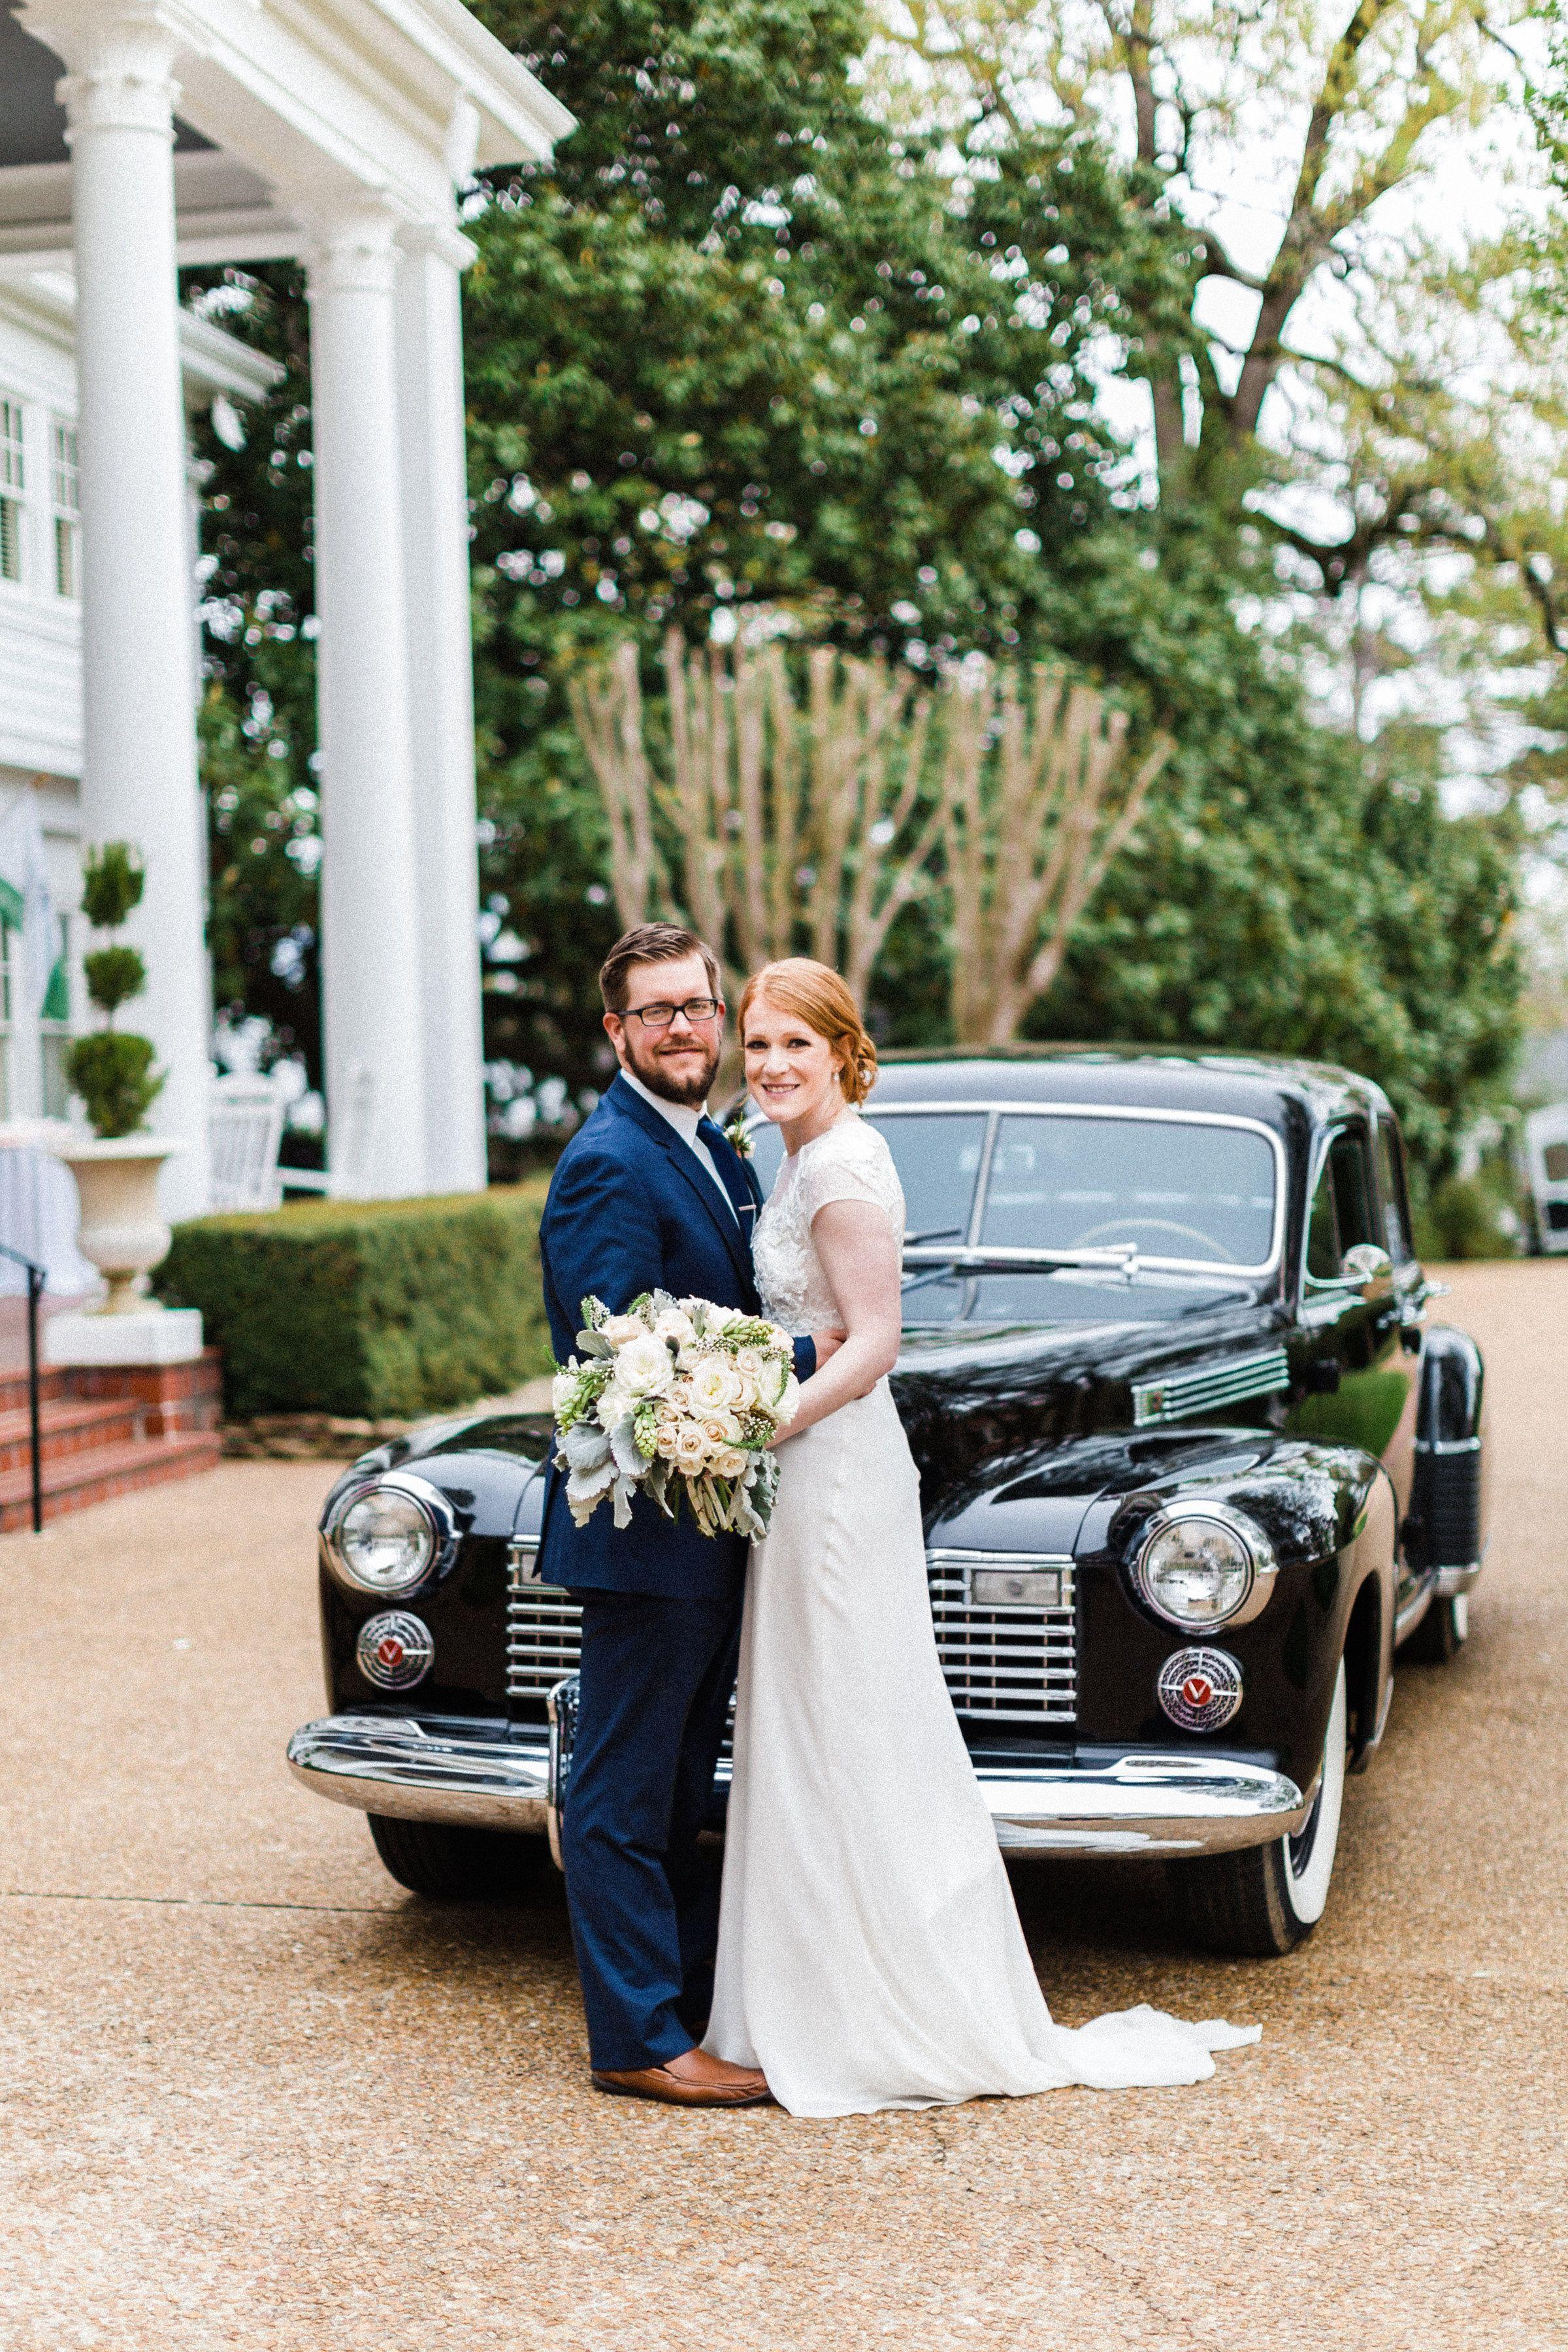 A classic wedding getaway for this Fairview Inn spring ...